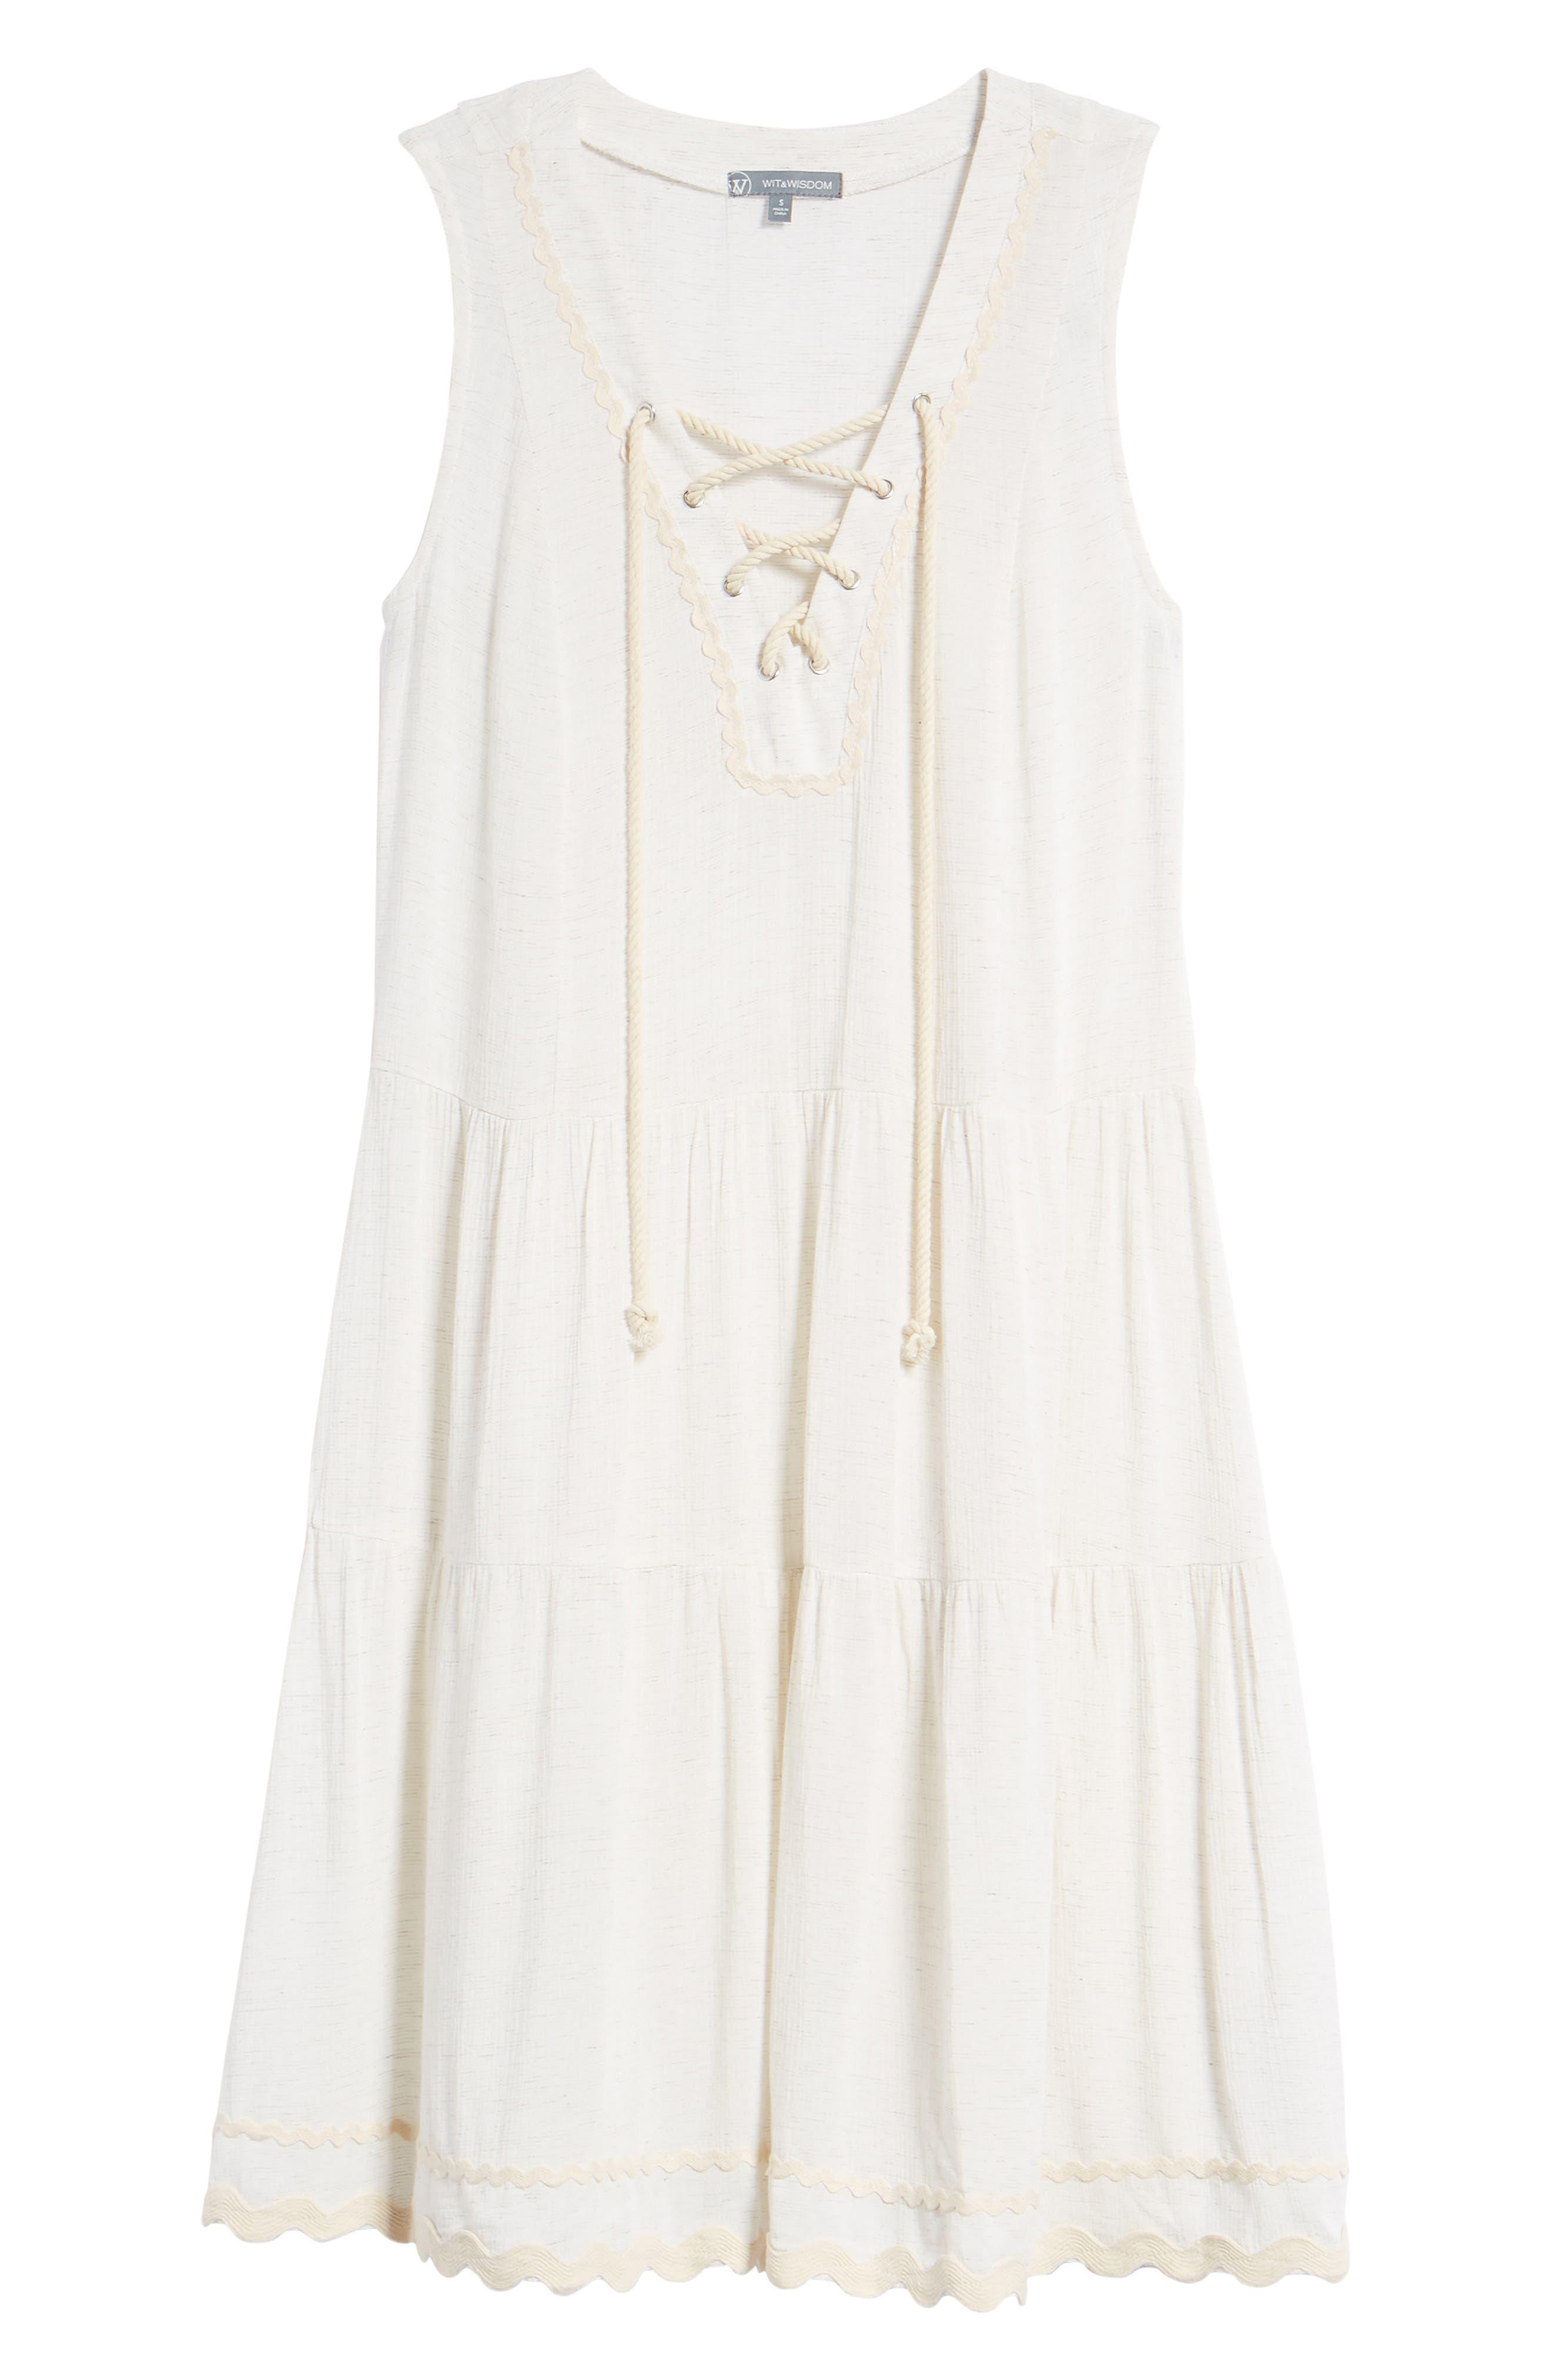 Rickrack Lace-Up Gauze Dress,                             Alternate thumbnail 7, color,                             101